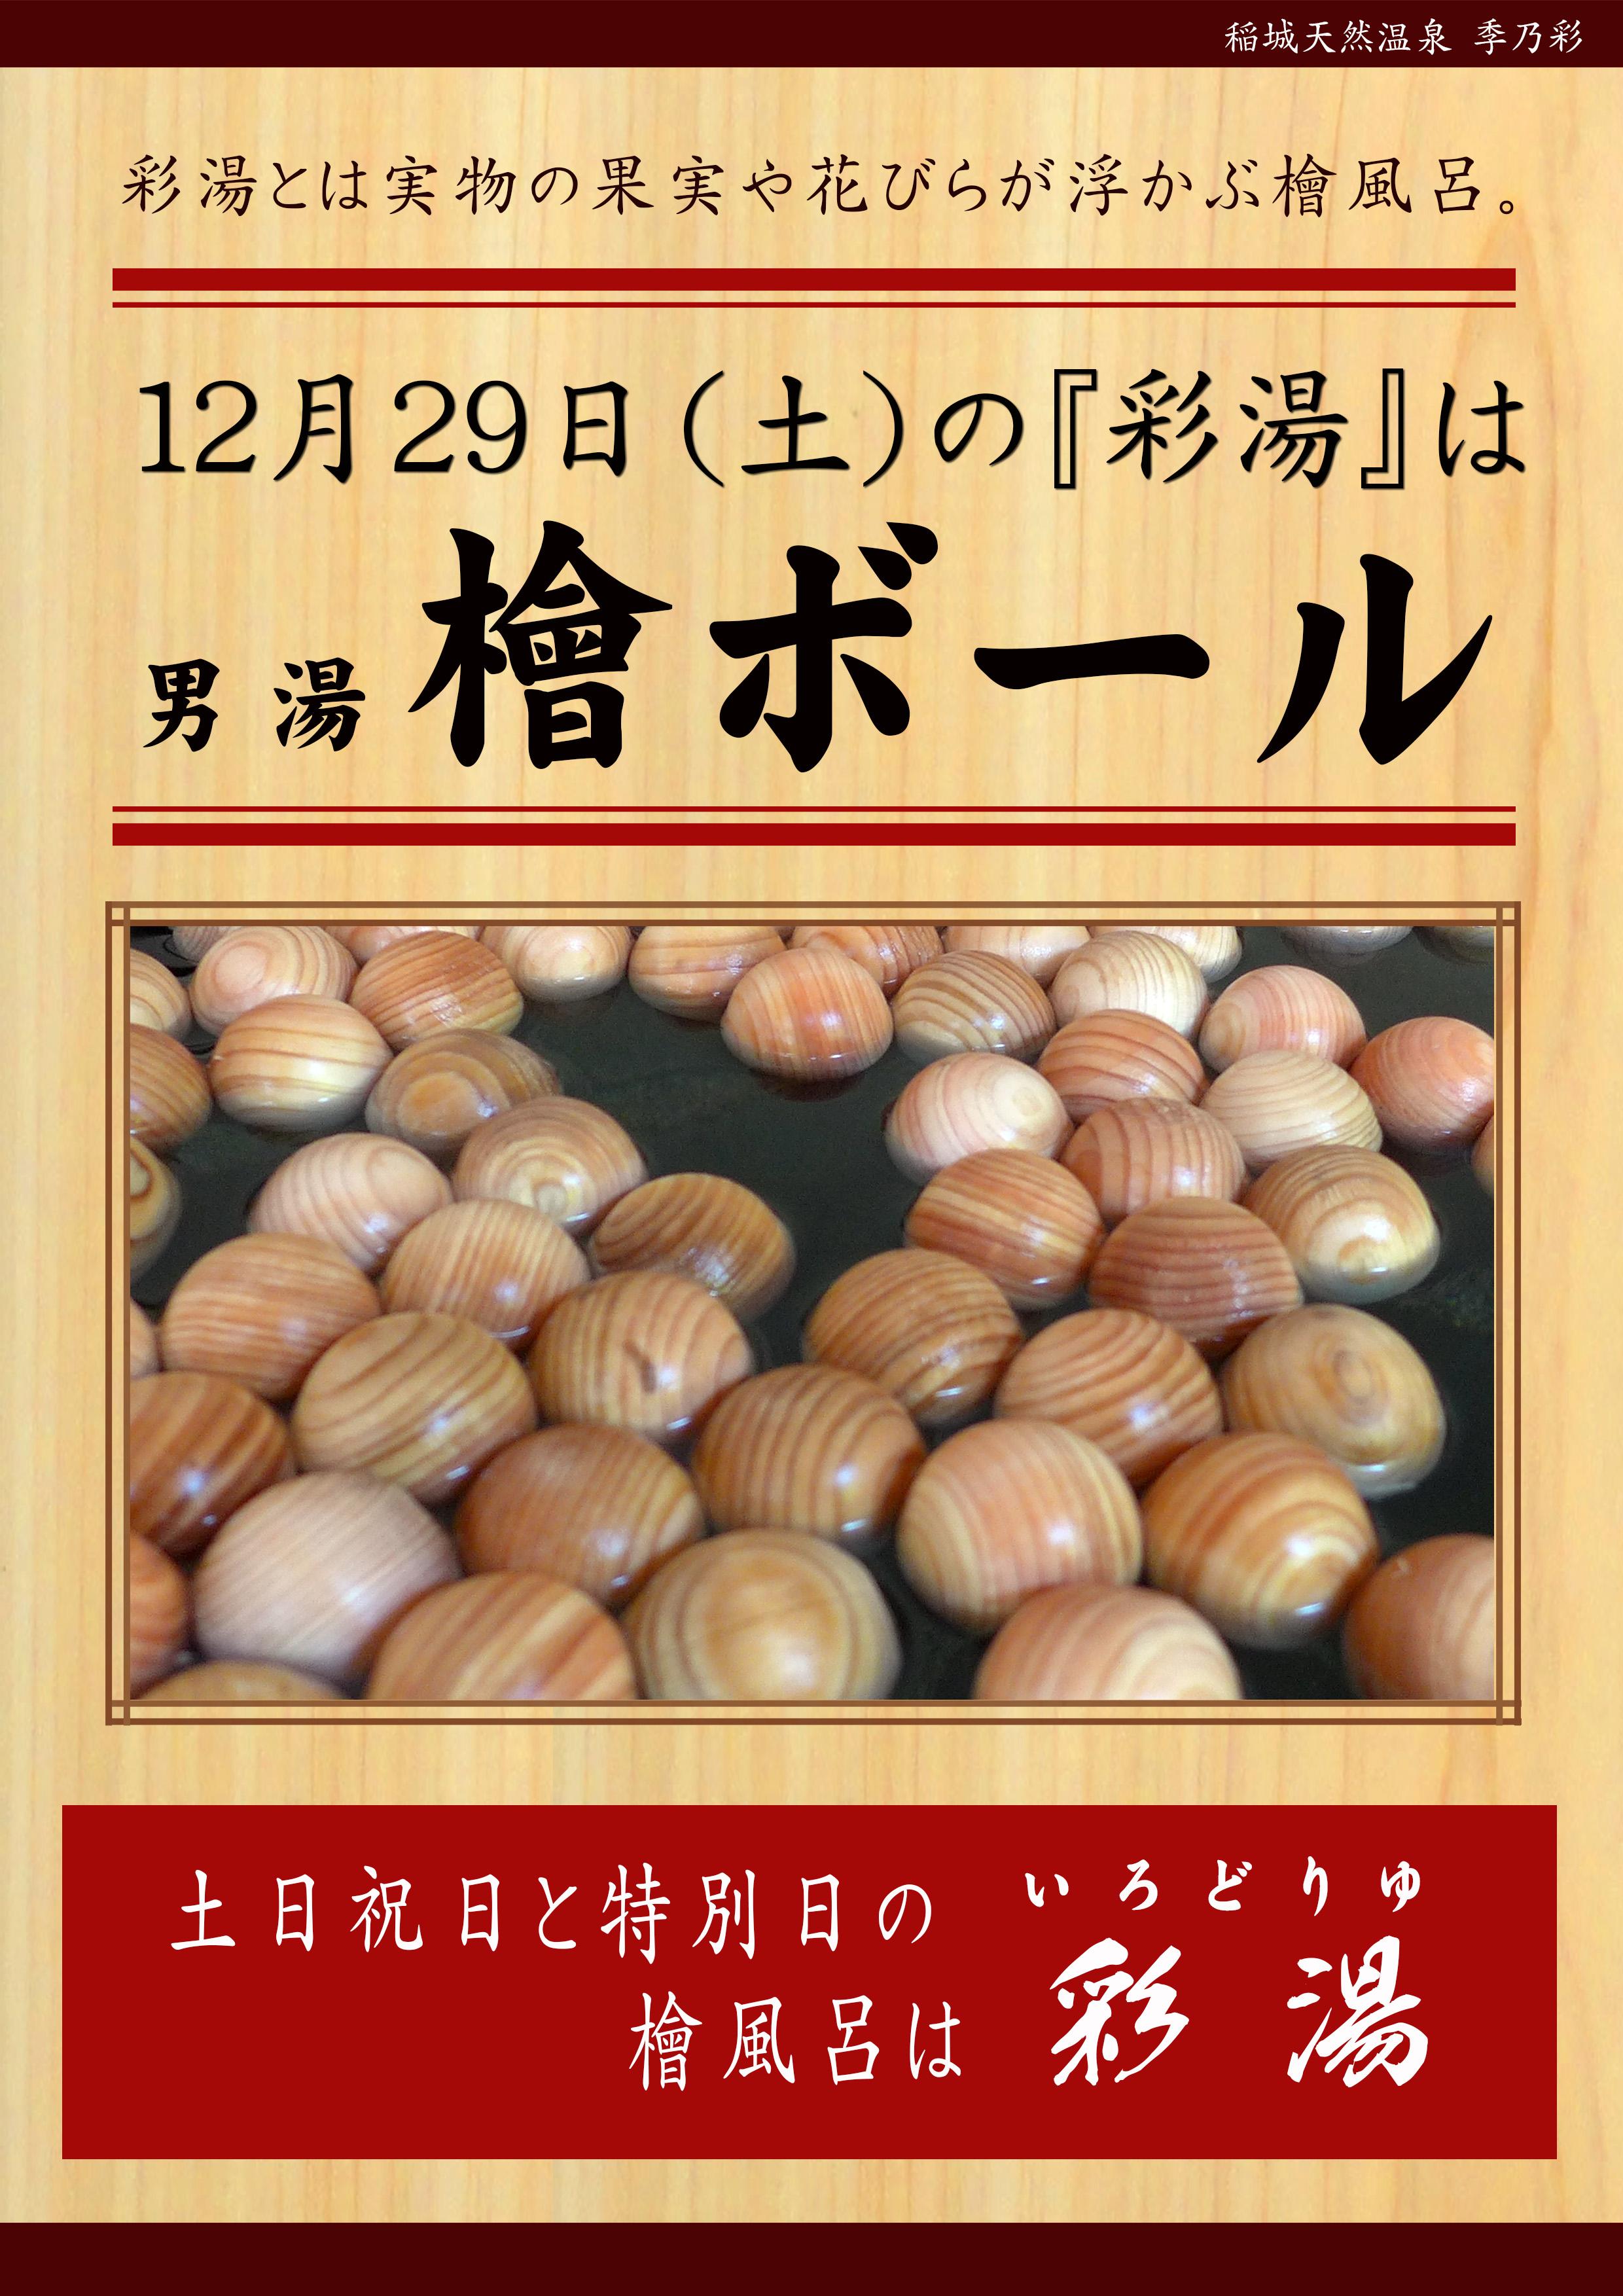 20181229POP イベント 彩湯 男湯 檜ボール